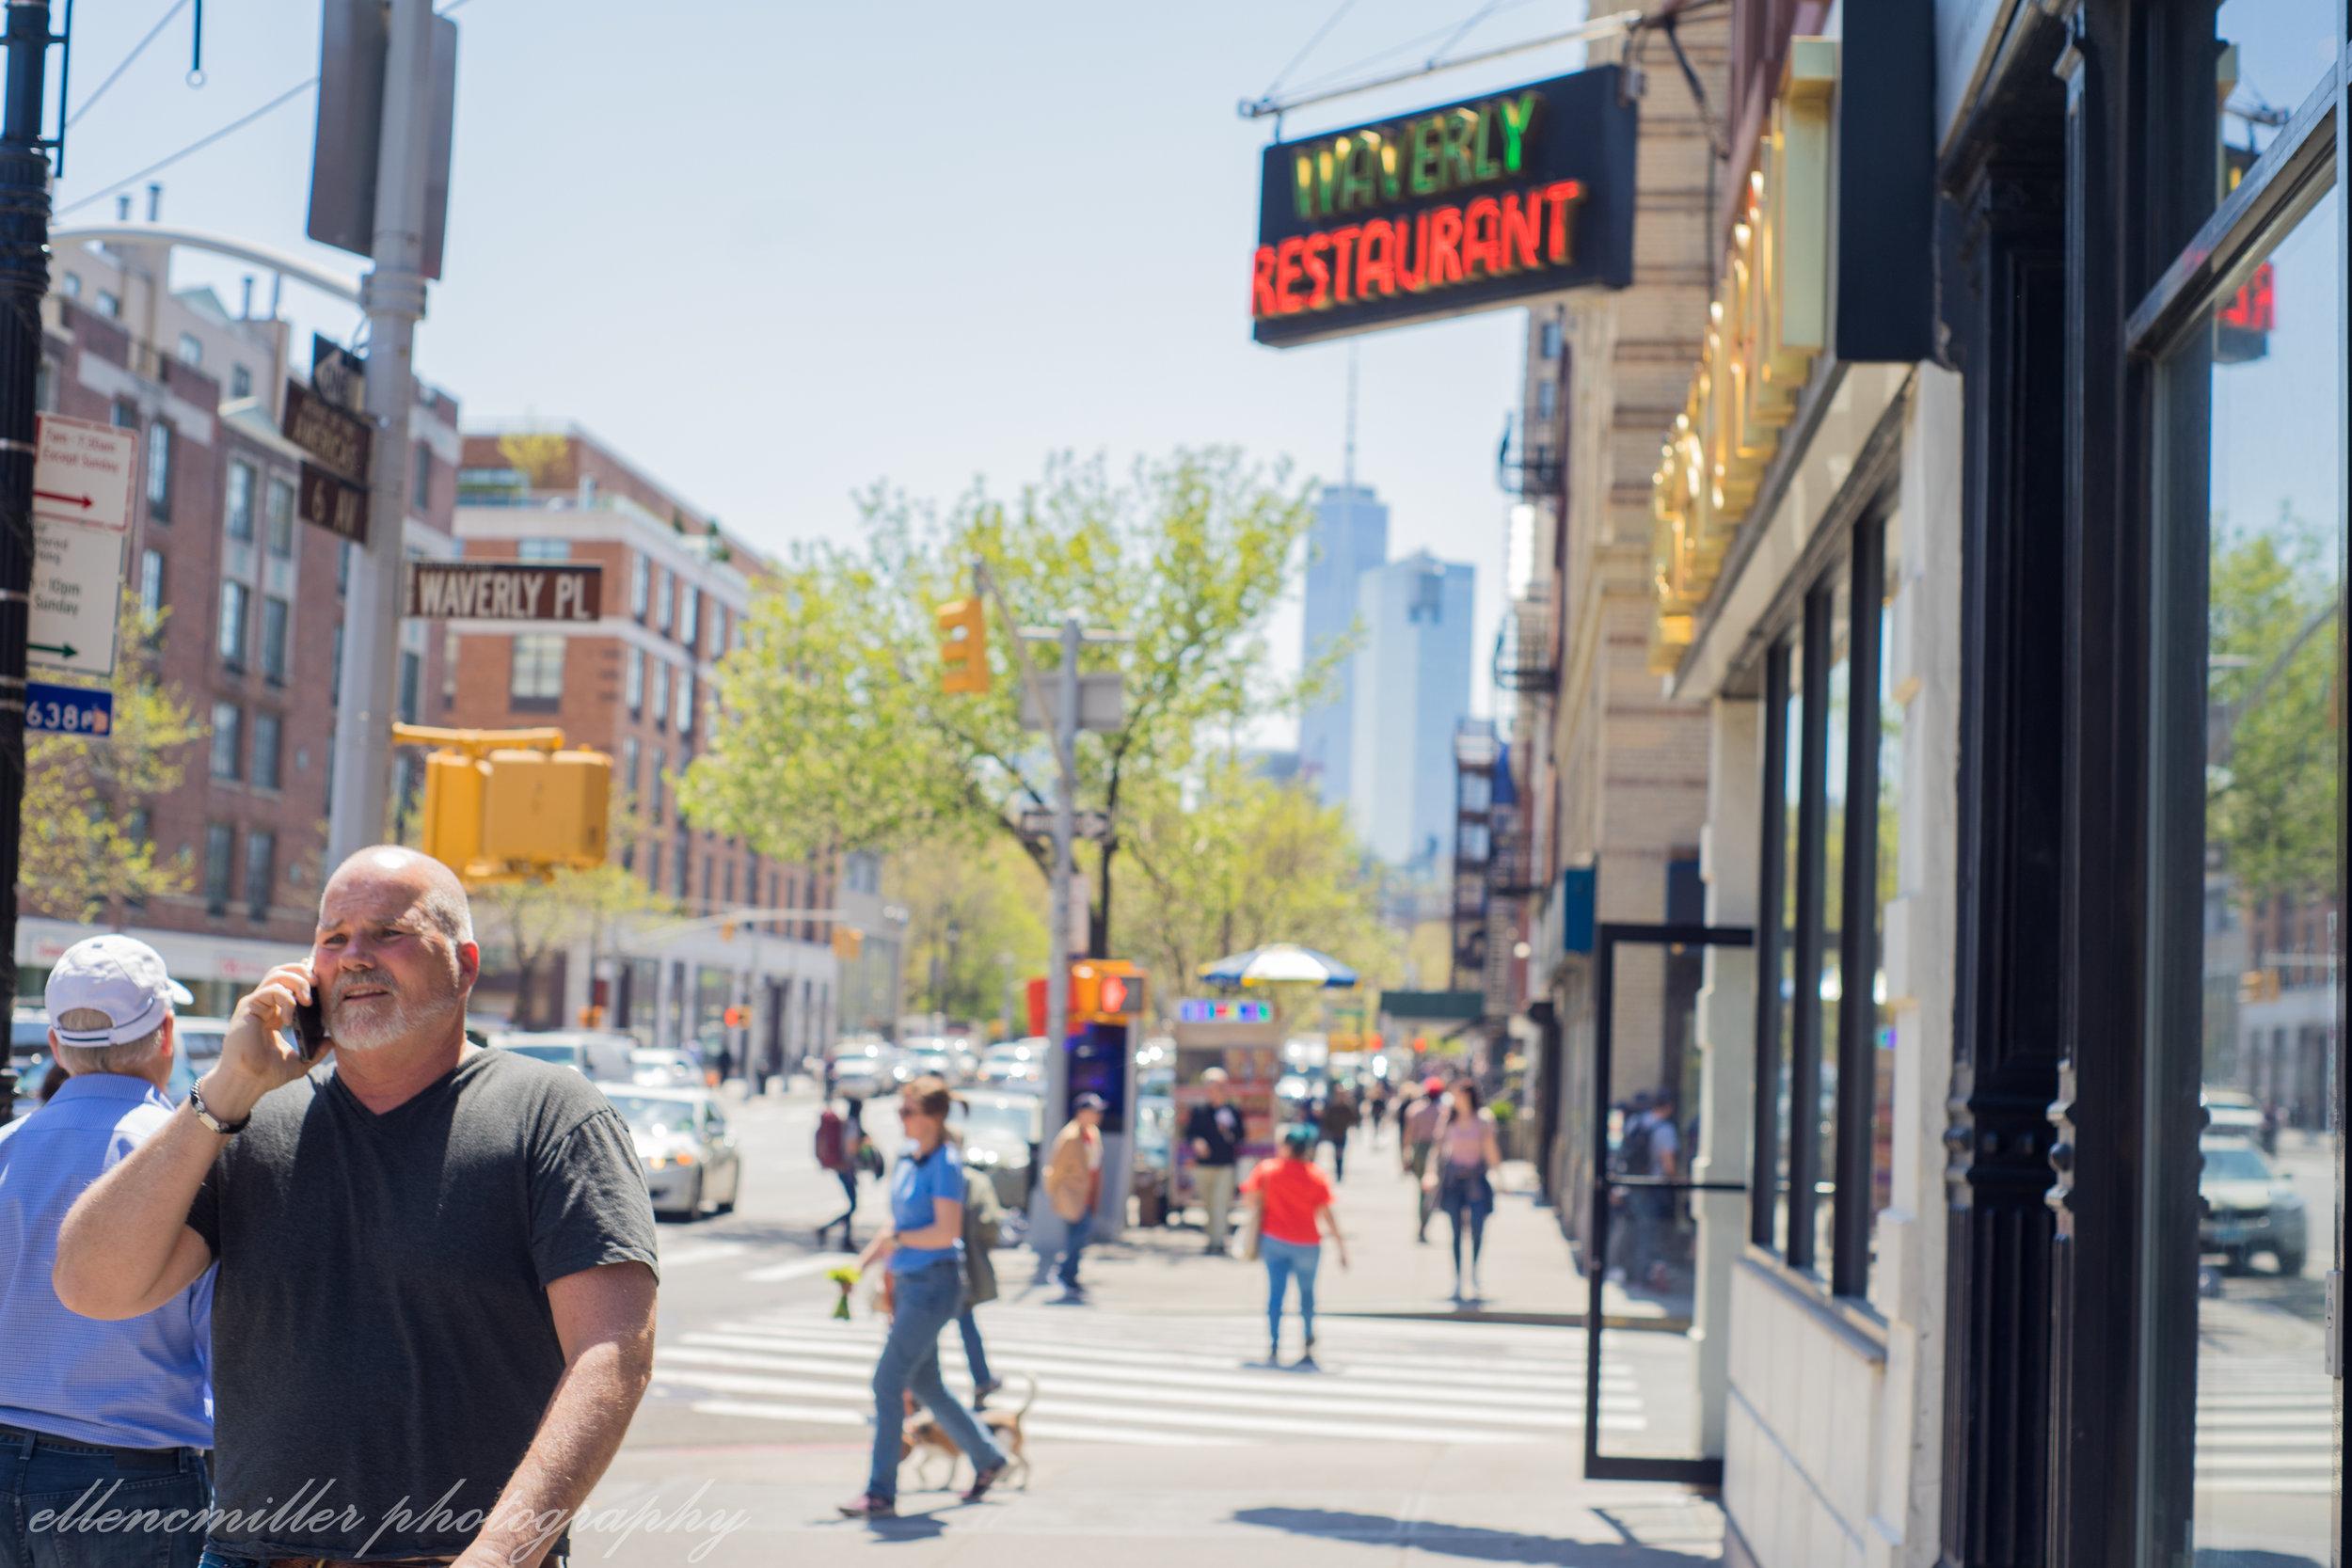 NYC-050118-6.jpg